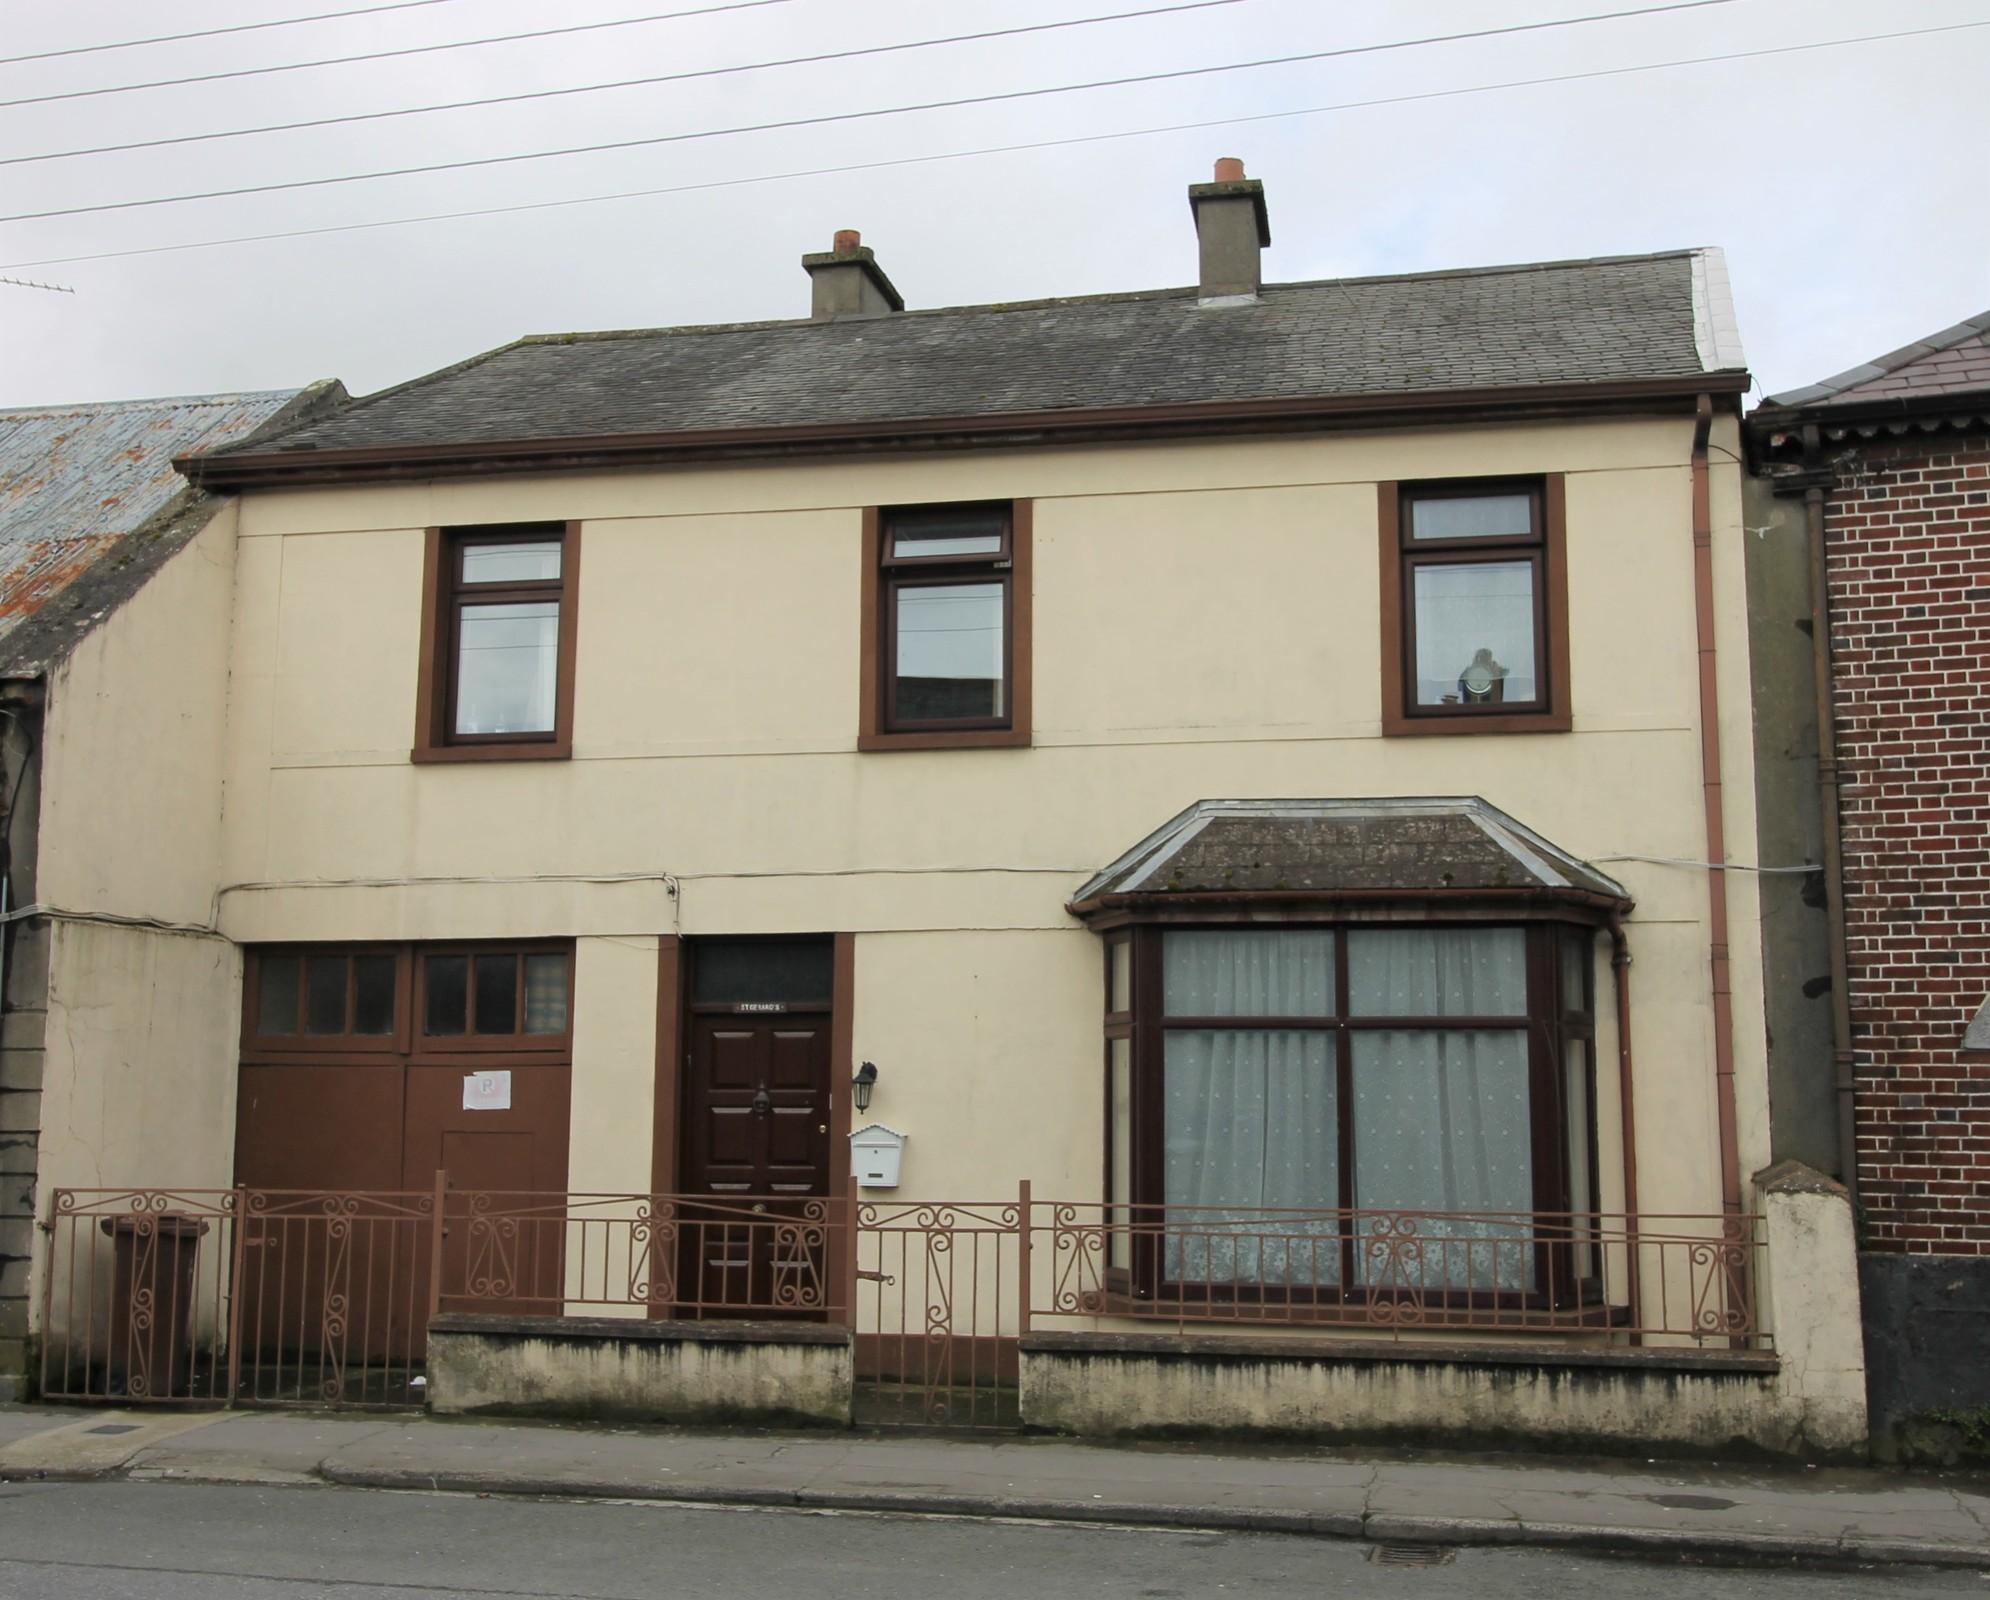 Saint Gerards, Mitchel Street, Thurles, Co. Tipperary